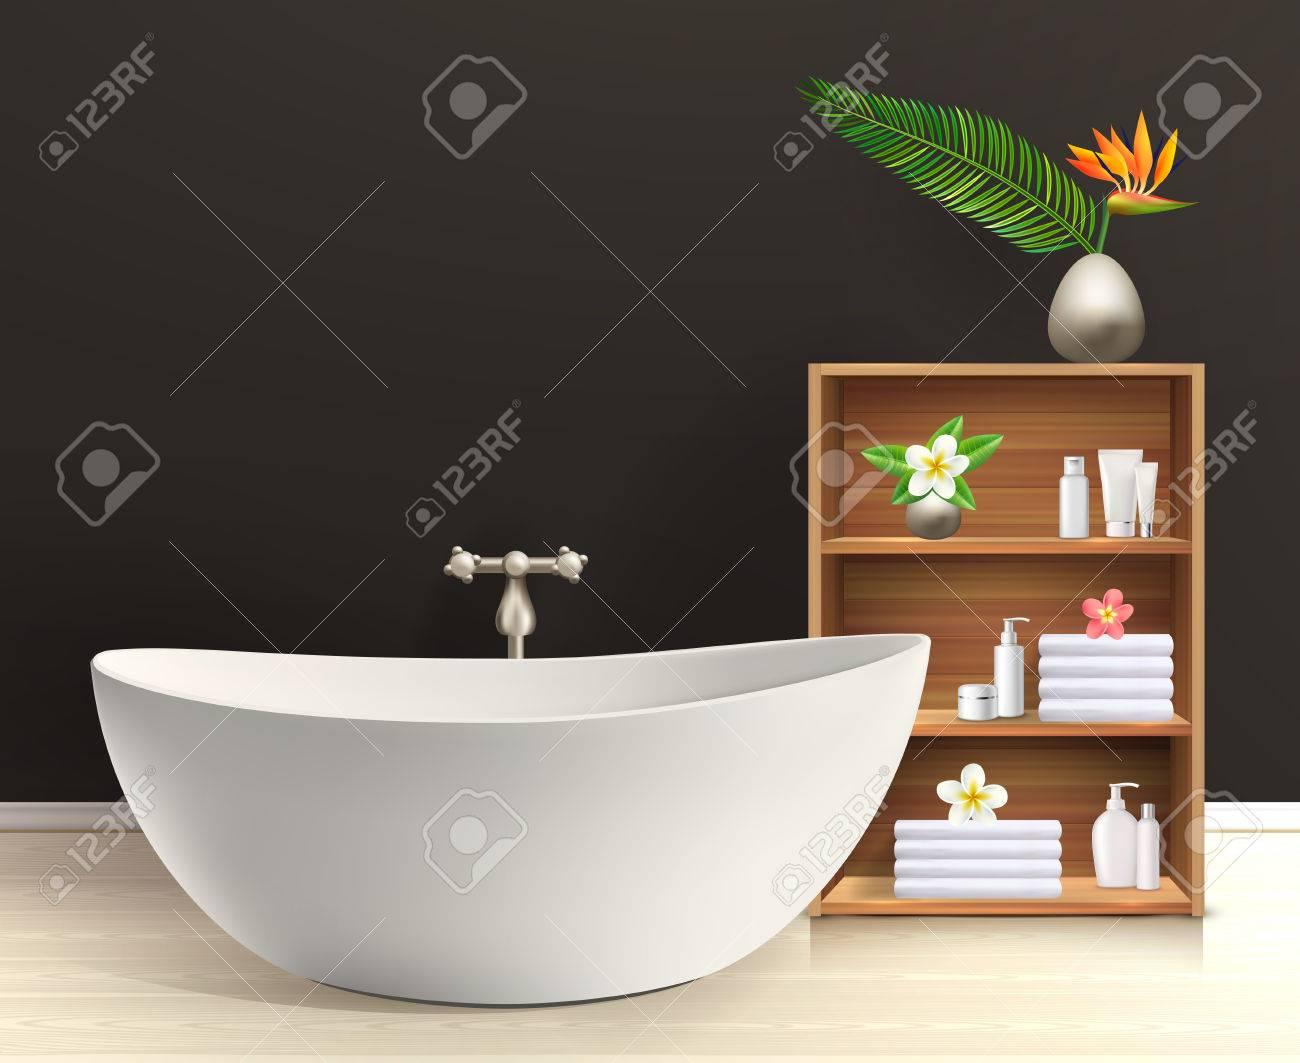 Badezimmer Inter Plakat Bad Im Retro Stil Badezimmer Mit Mobel